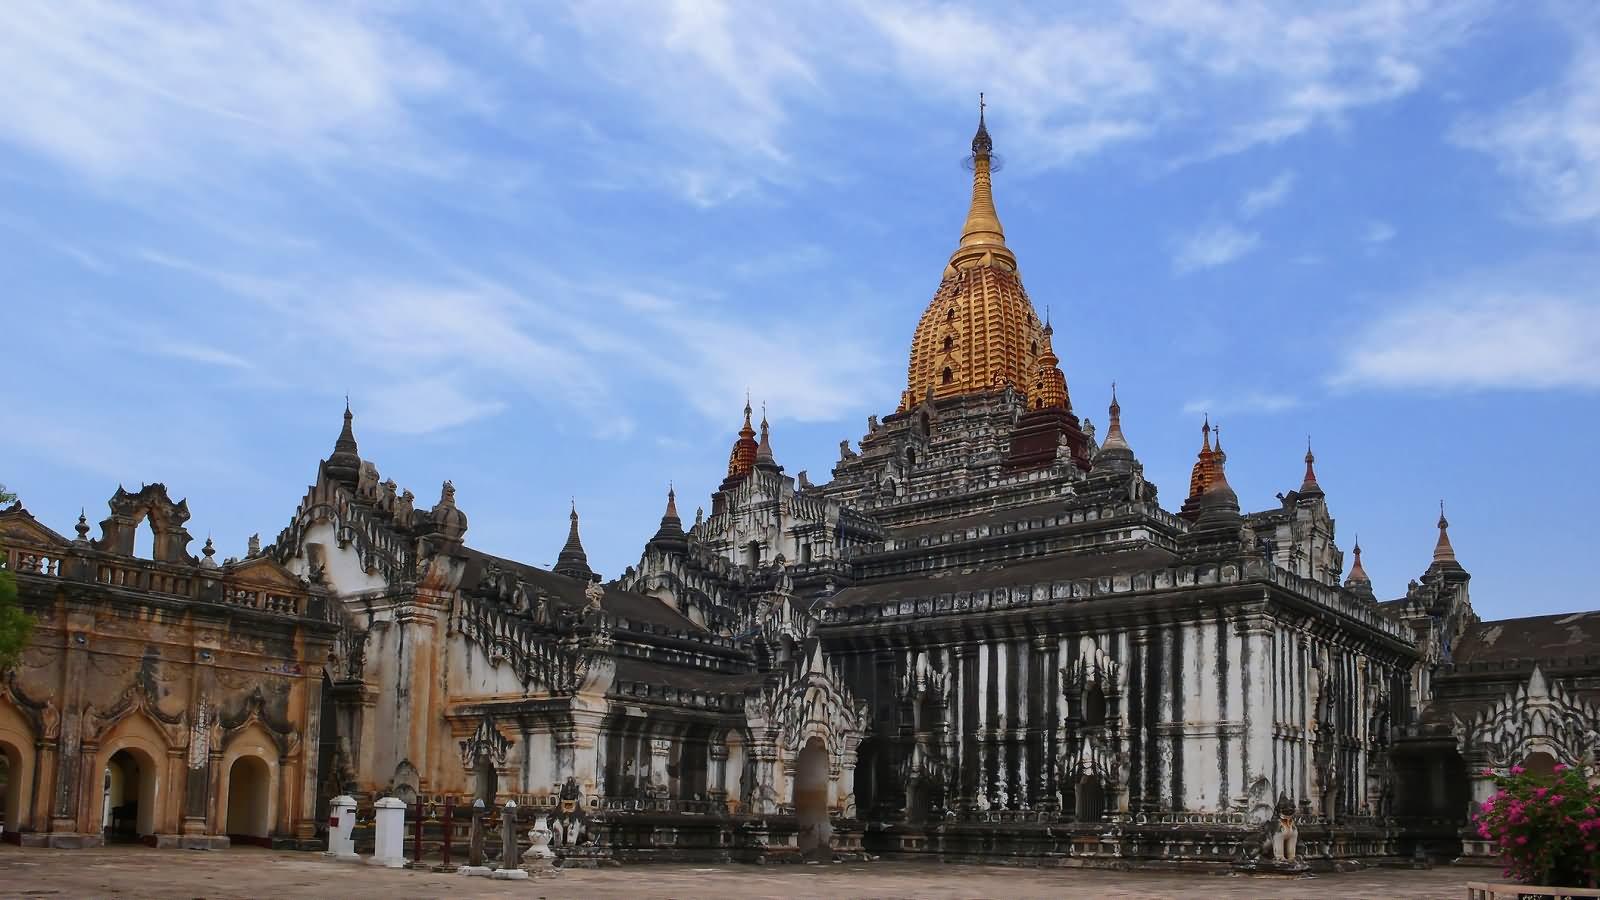 The Ananda Temple In Myanmar